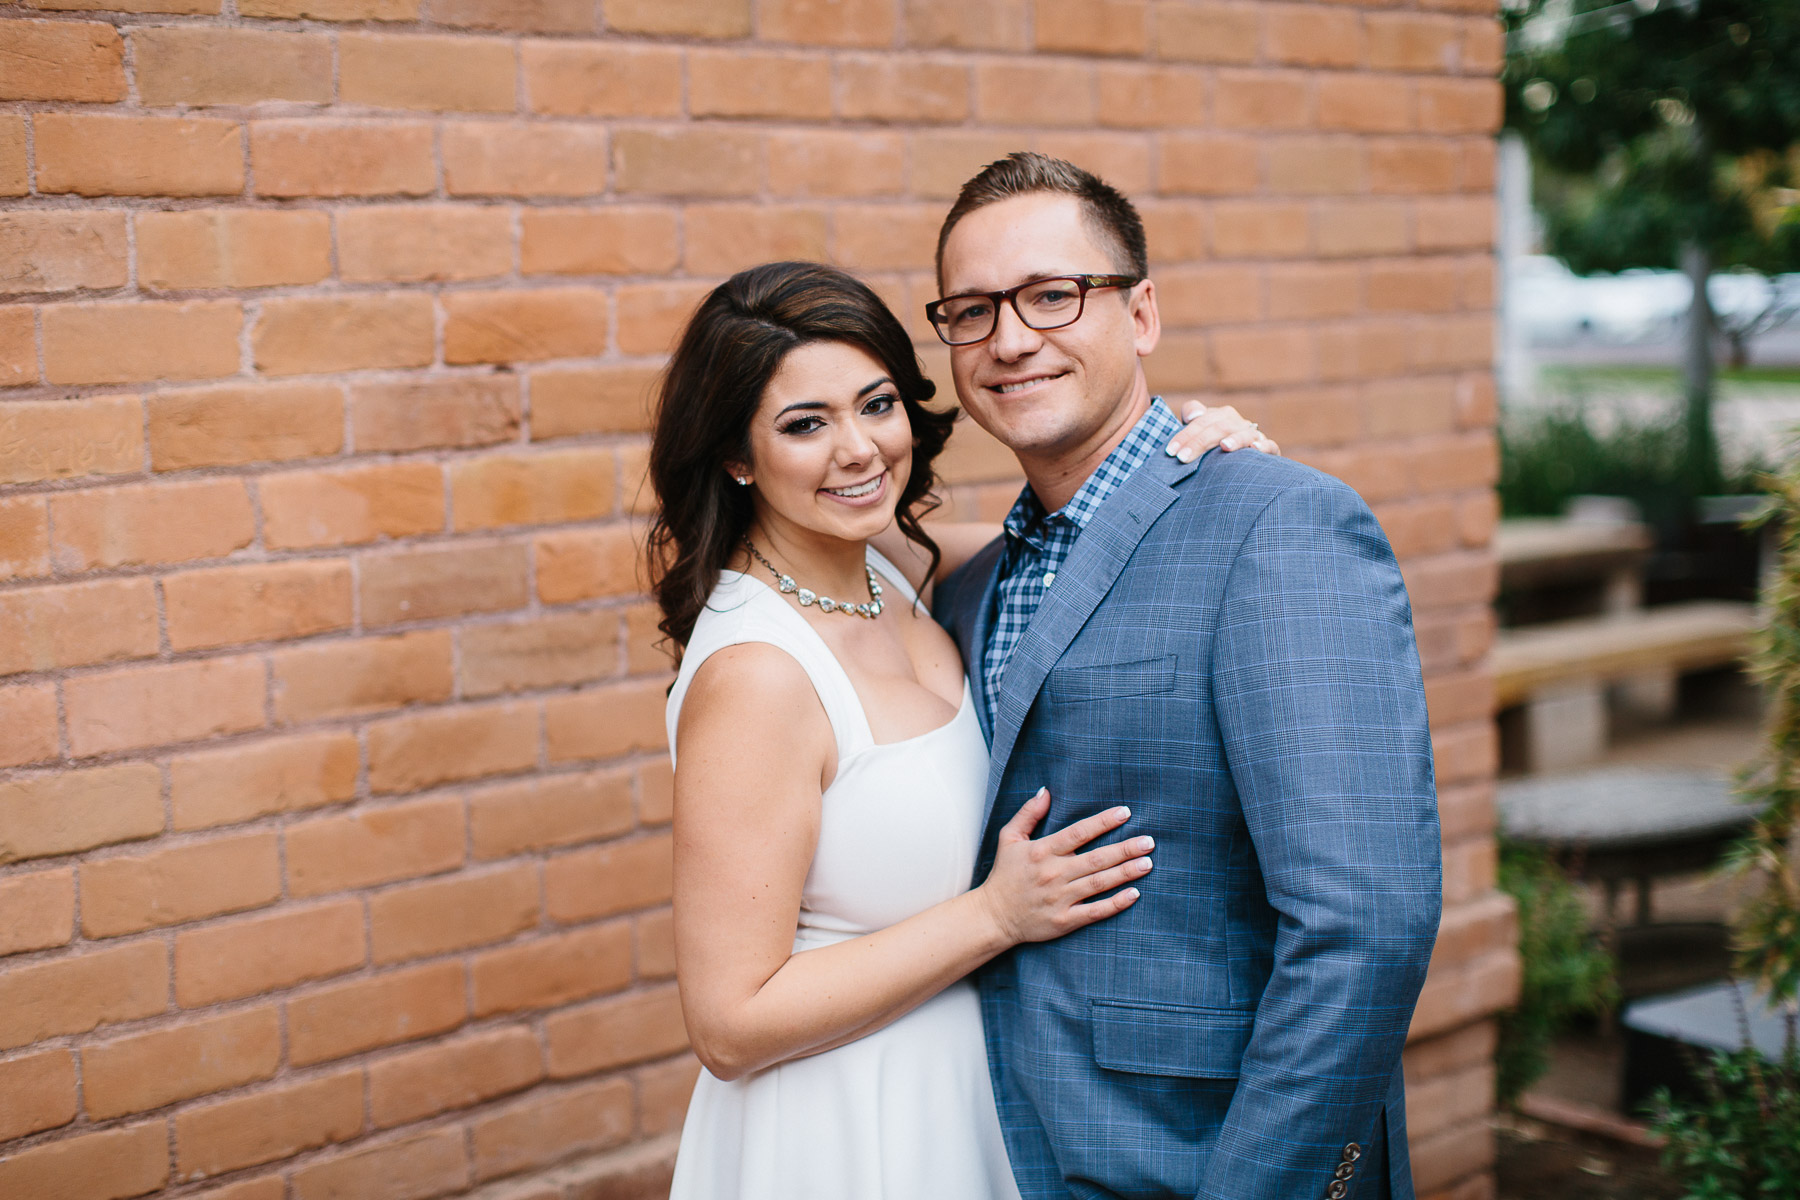 Luxium-Weddings-@matt__le-Engagement-Heritage-Square-Park-Downtown-Phoenix-Urban-Photography-103.jpg